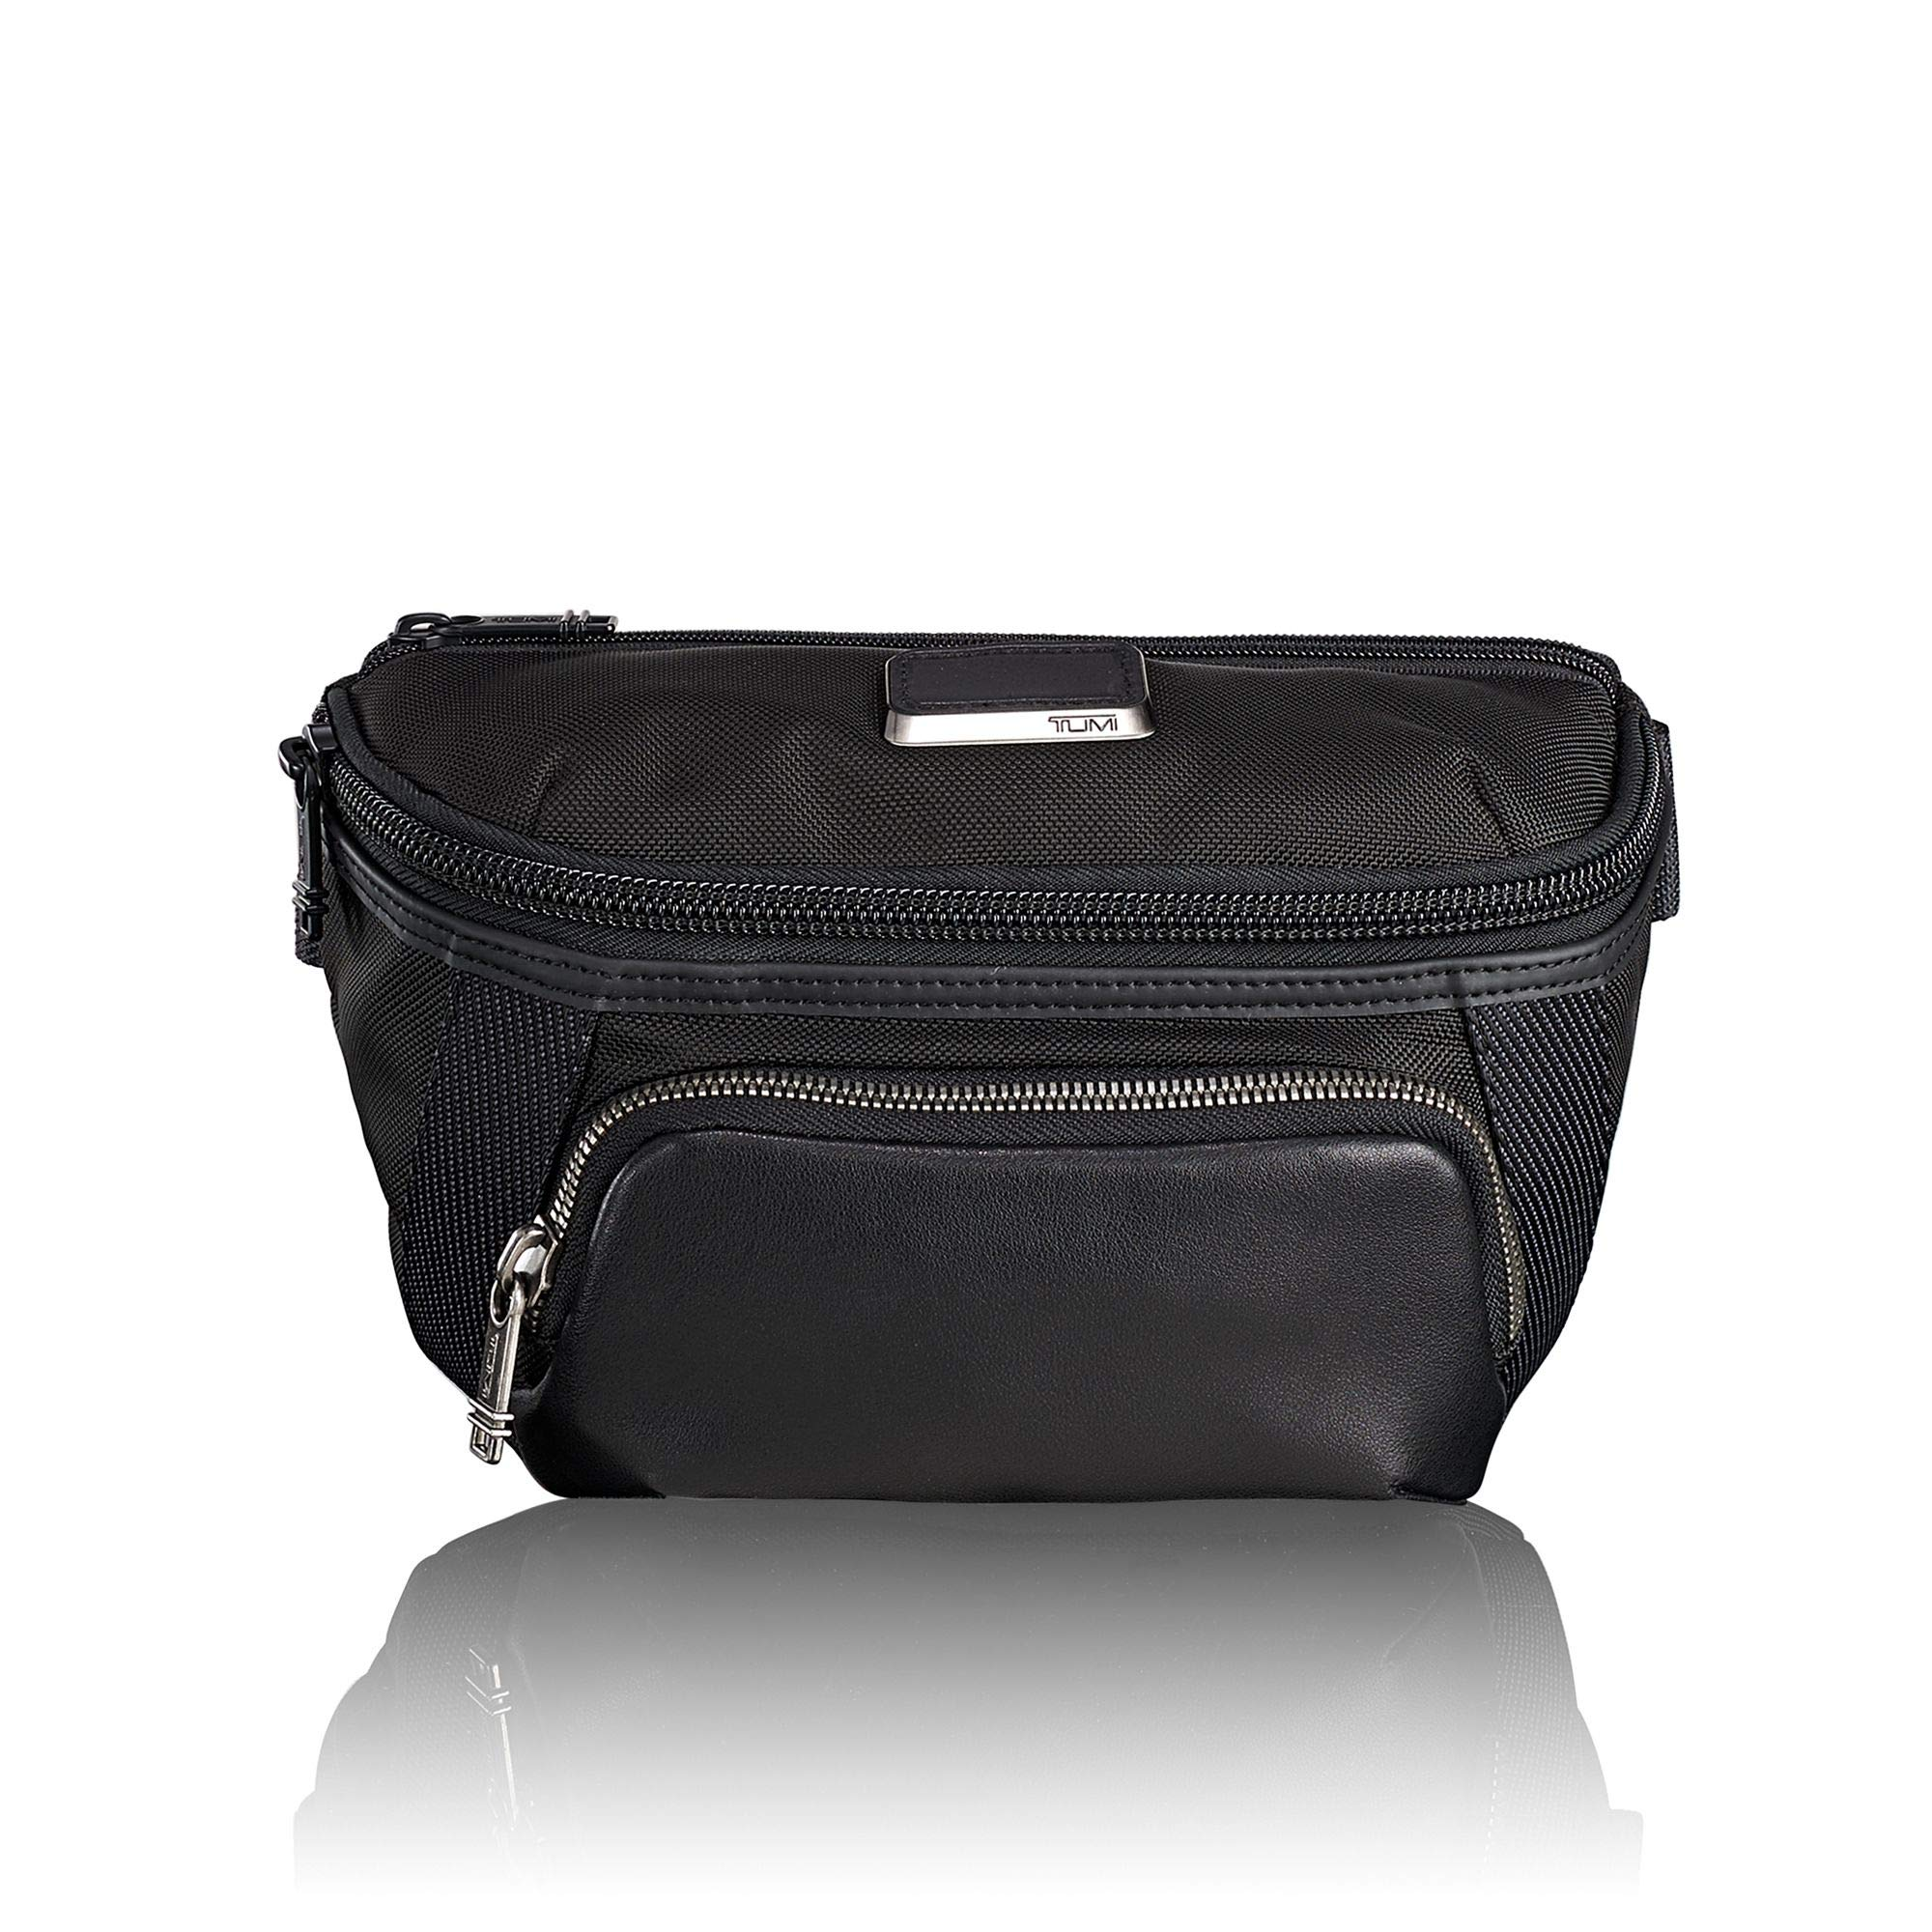 TUMI - Alpha Bravo Columbus Utility Pouch Waist Pack - Crossbody Bags for Men and Women - Black